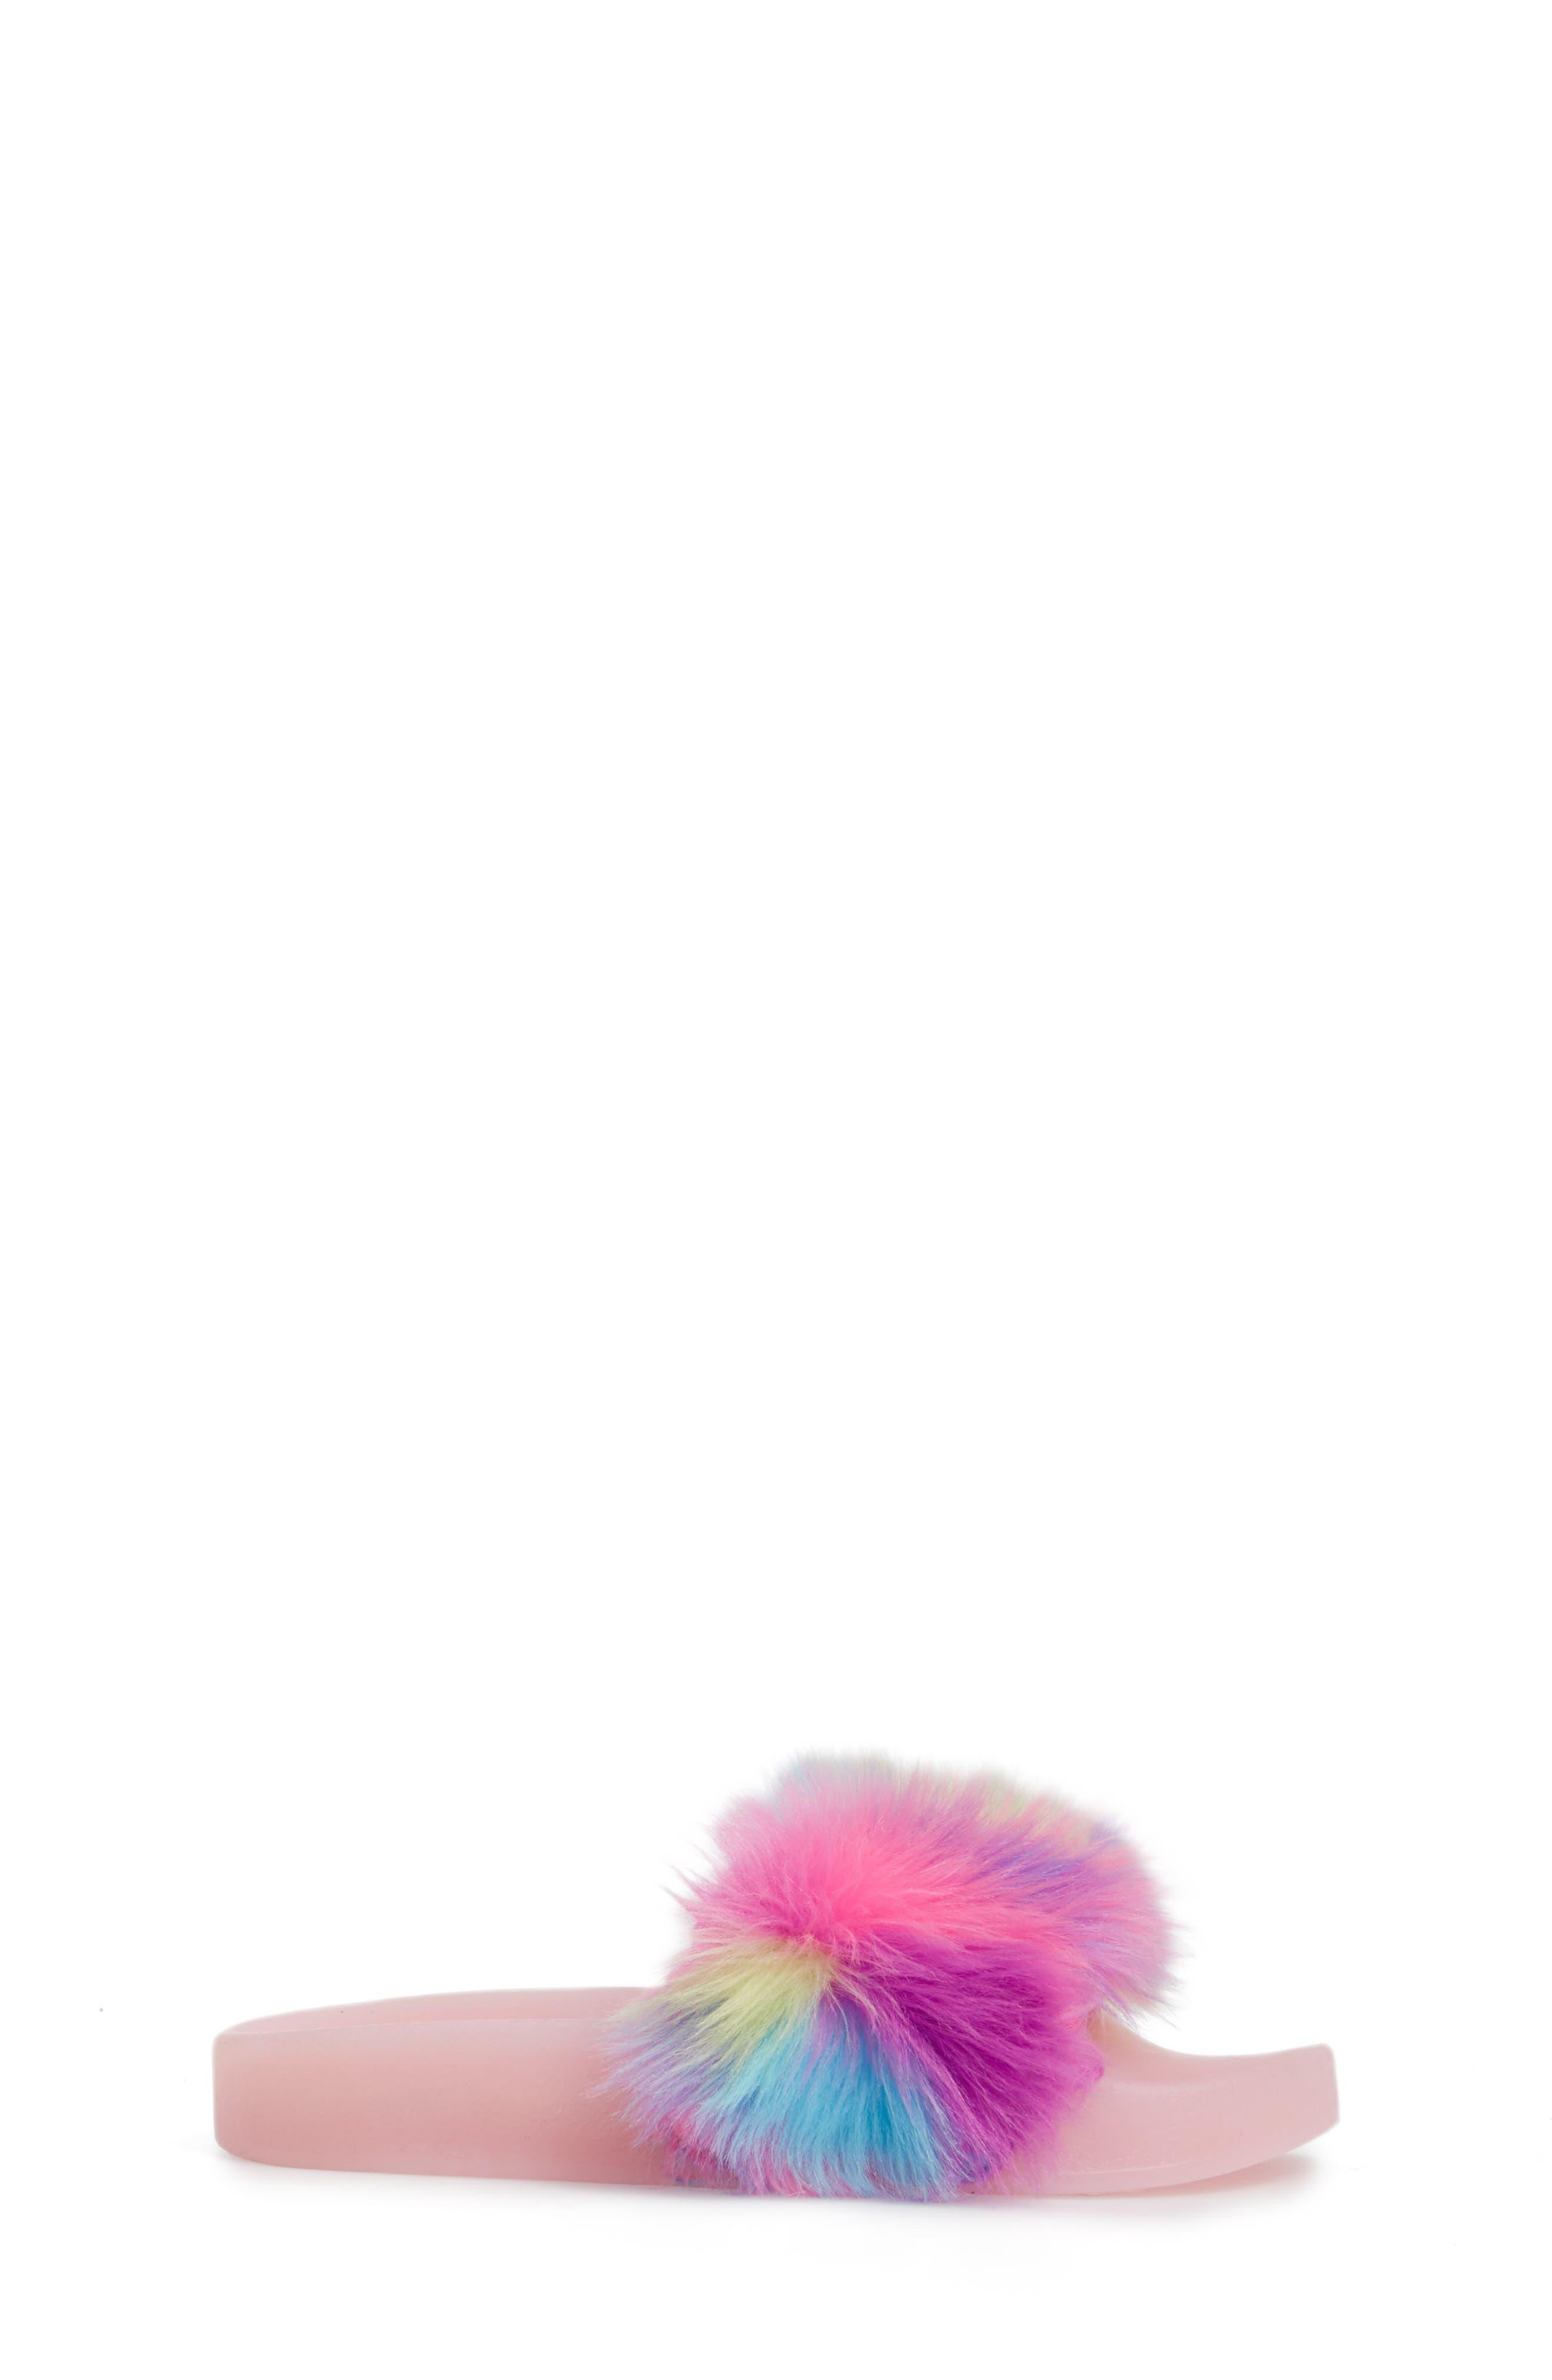 Jlights Faux Fur Light-Up Slide Sandal,                             Alternate thumbnail 3, color,                             Multi